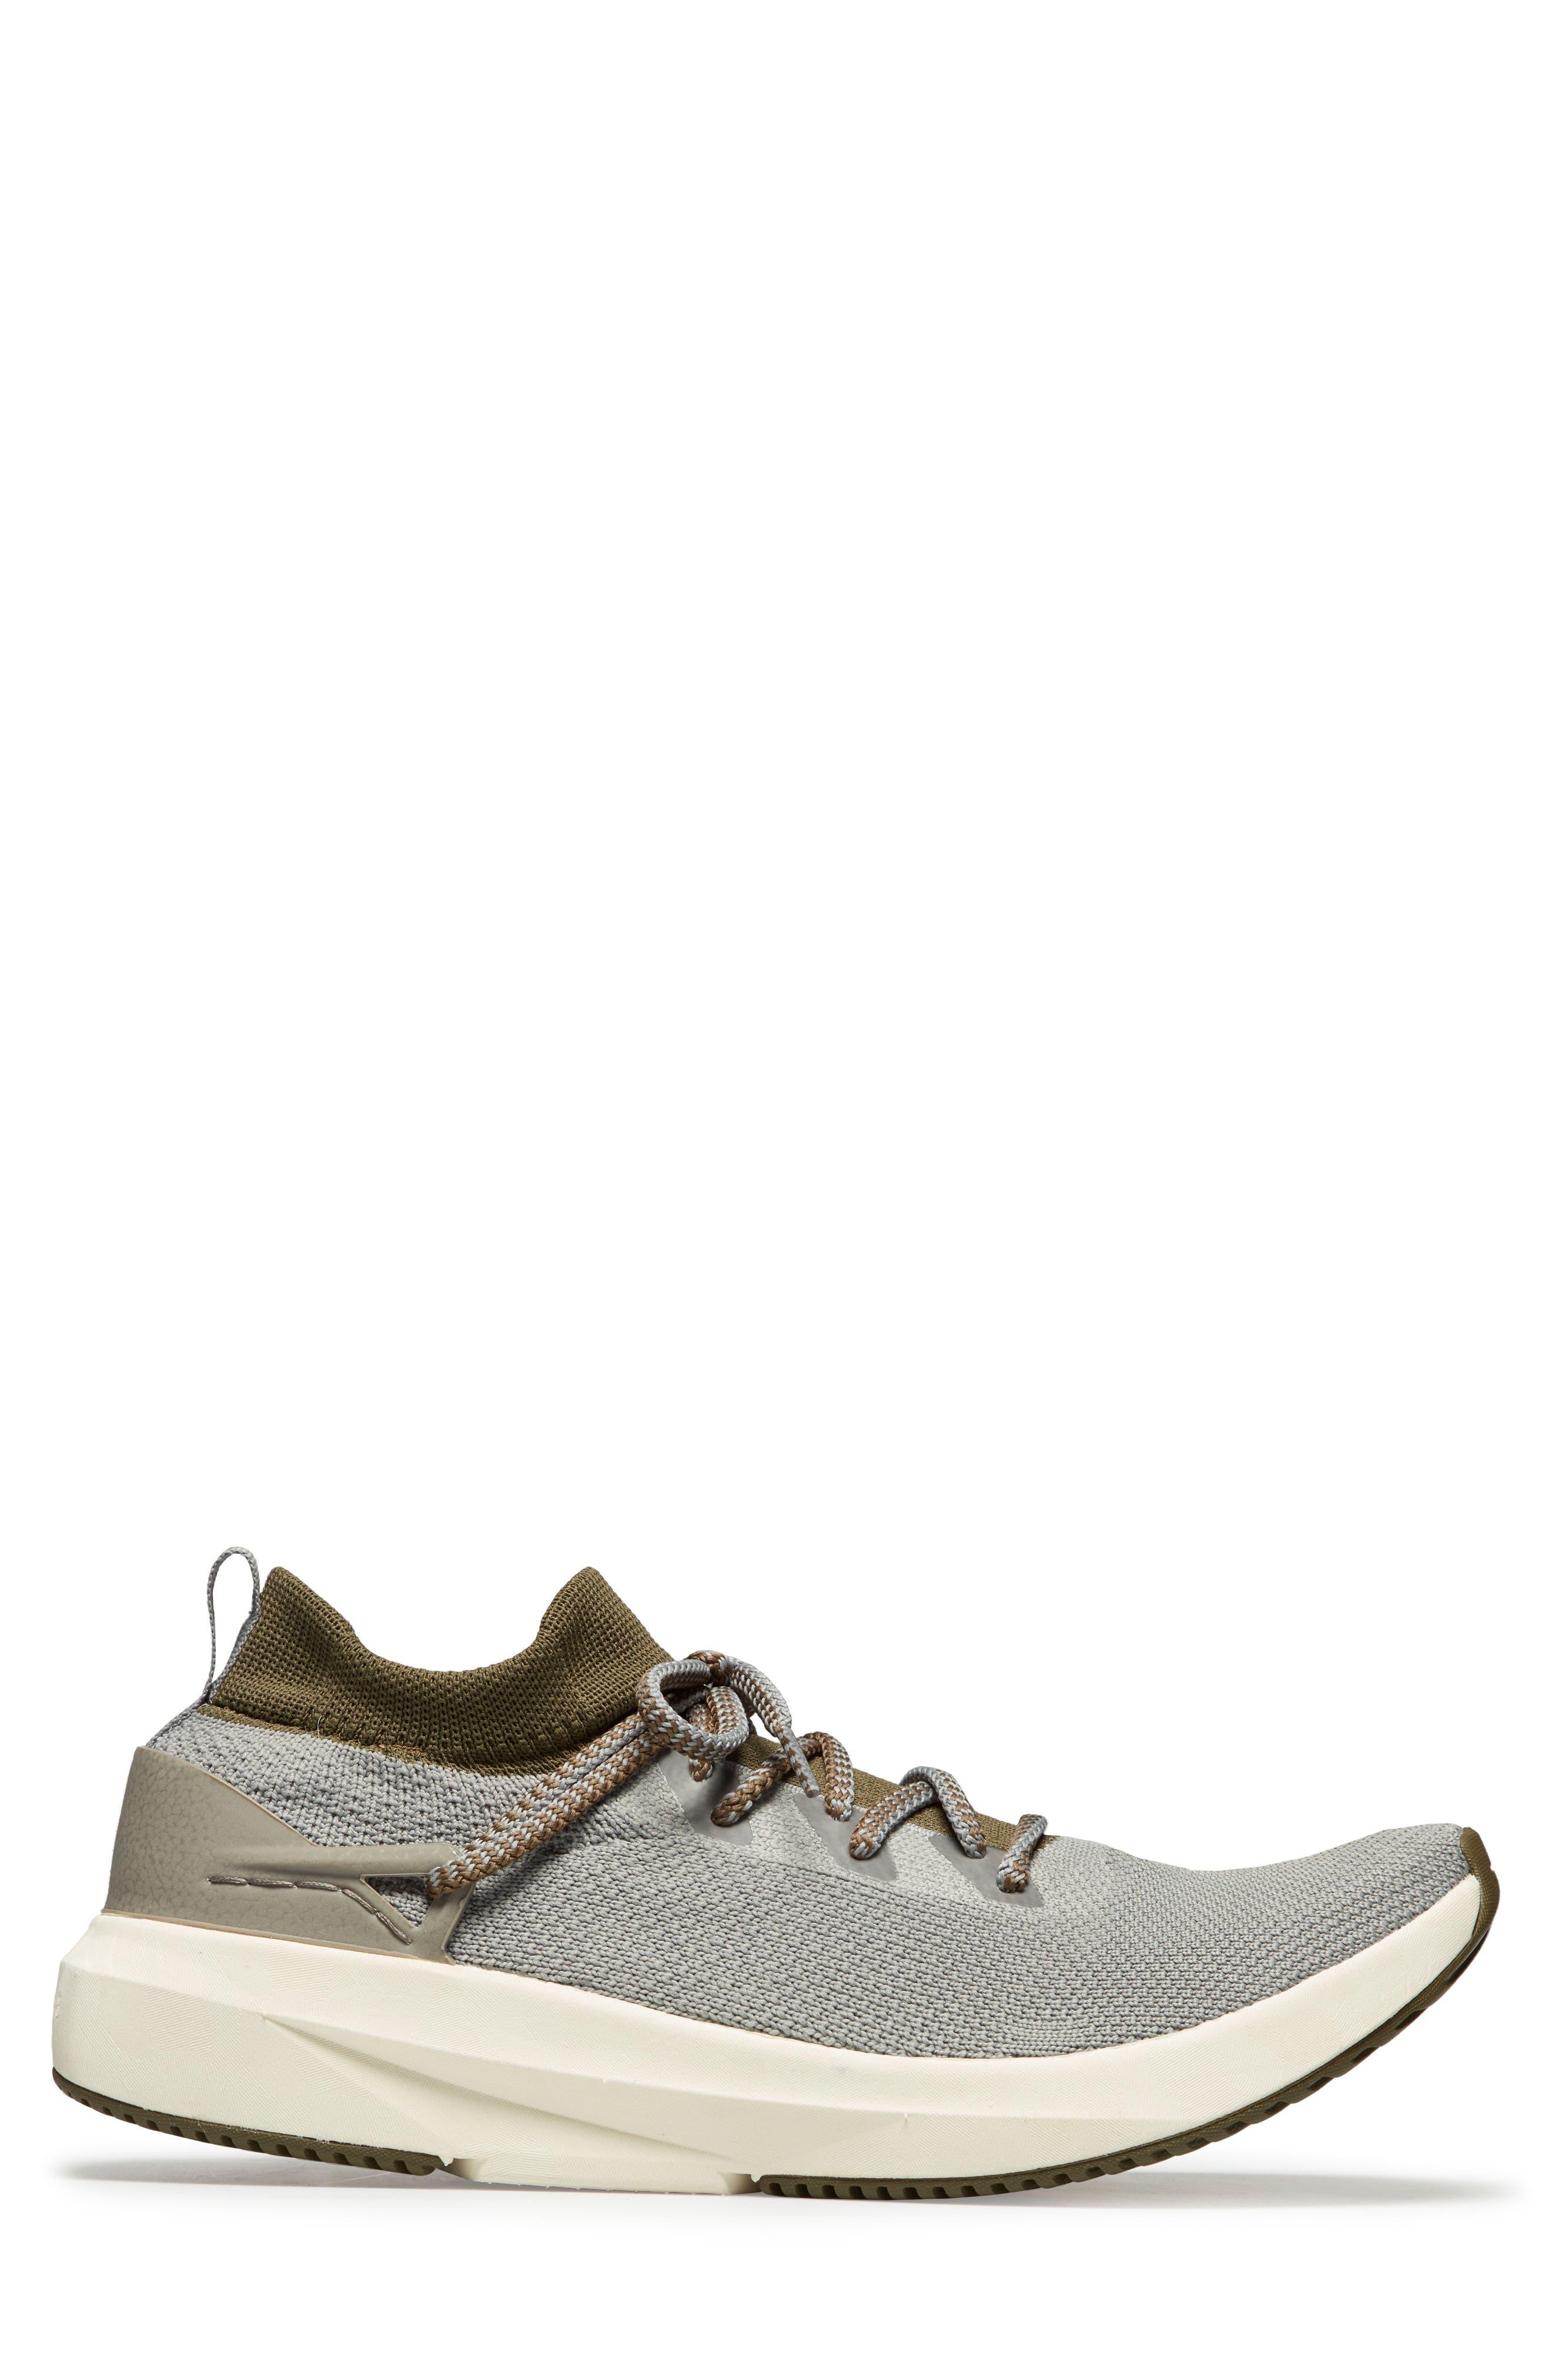 Kaze Sneaker,                             Alternate thumbnail 8, color,